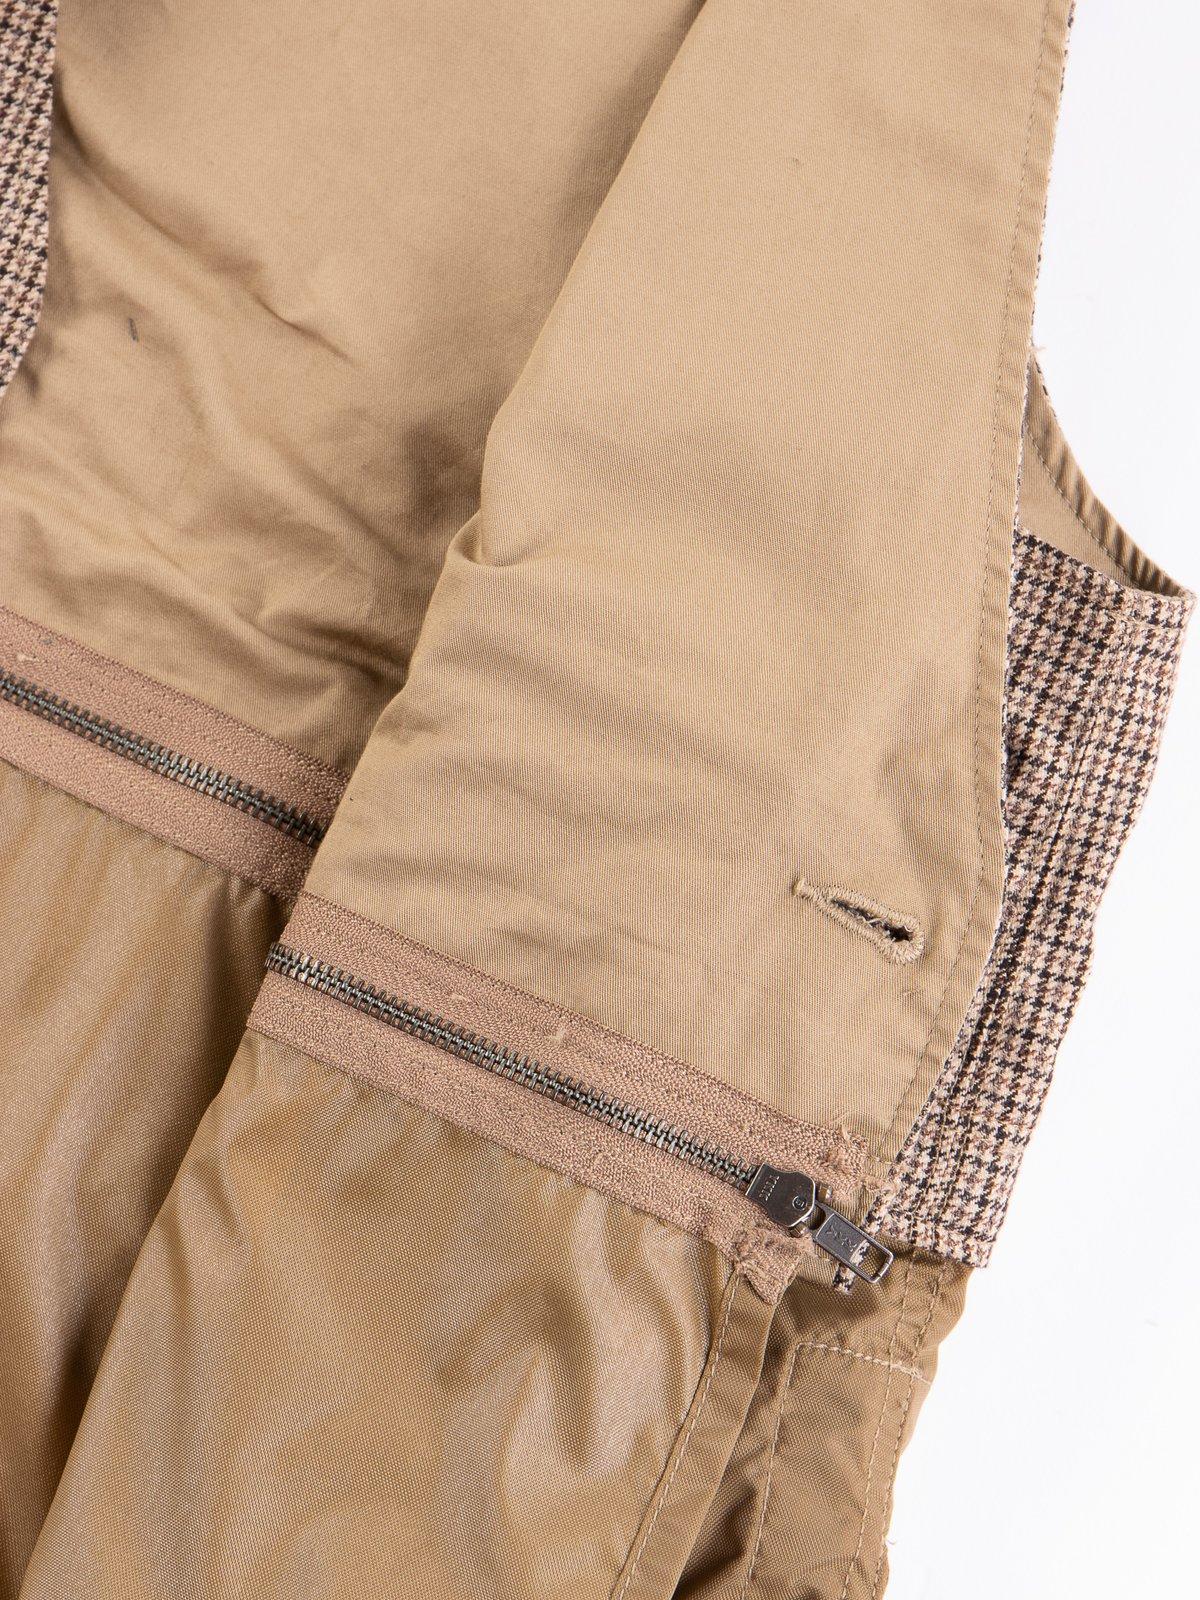 Brown Wool Poly Gunclub Check Long Fowl Vest - Image 6